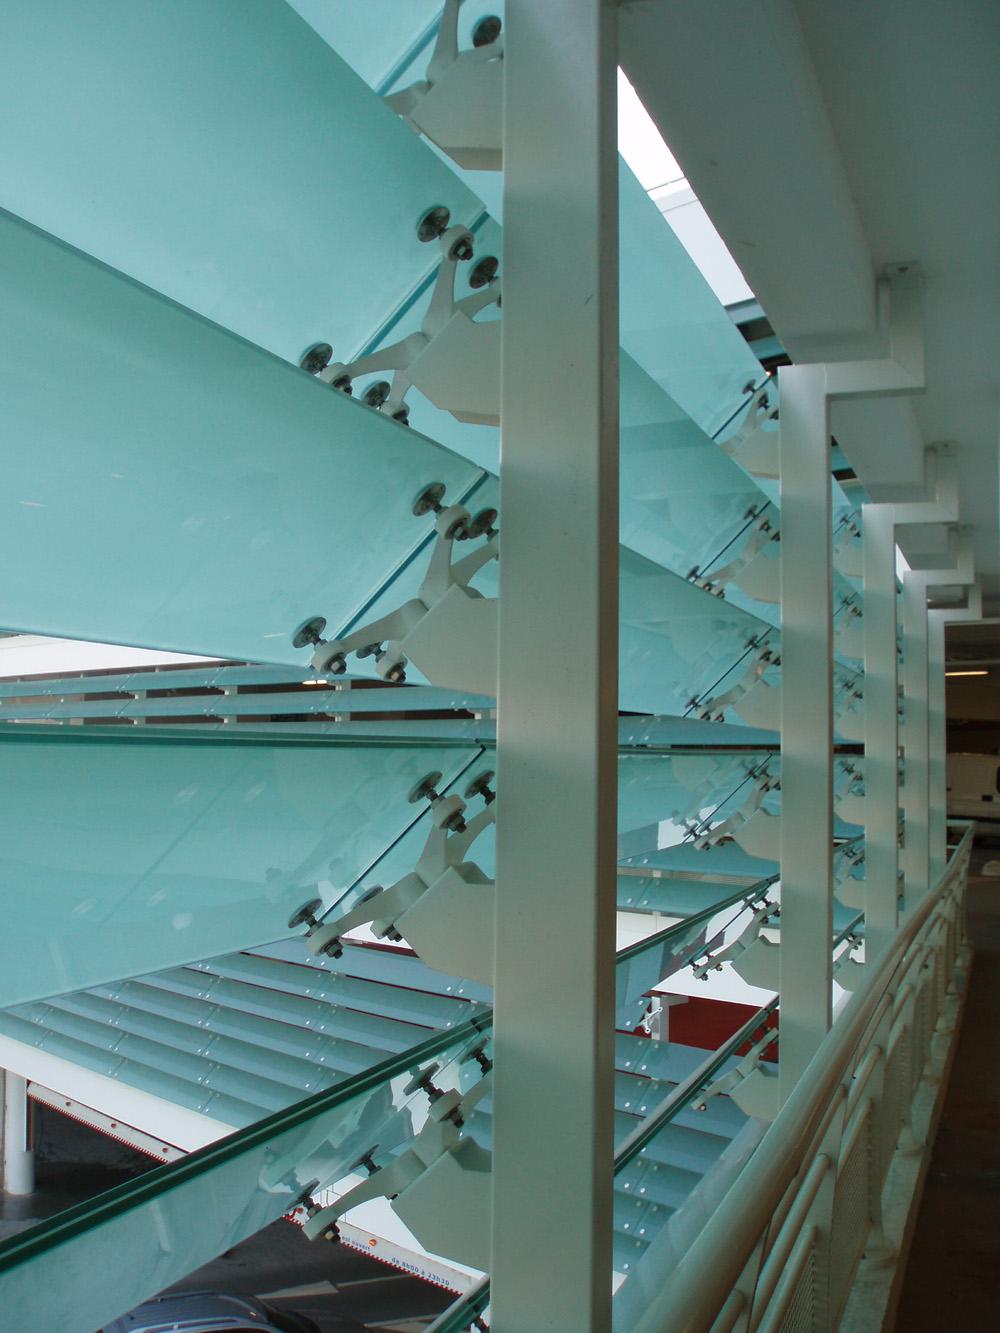 sunshades shopping mall sadev usa keokuk iowa. Black Bedroom Furniture Sets. Home Design Ideas